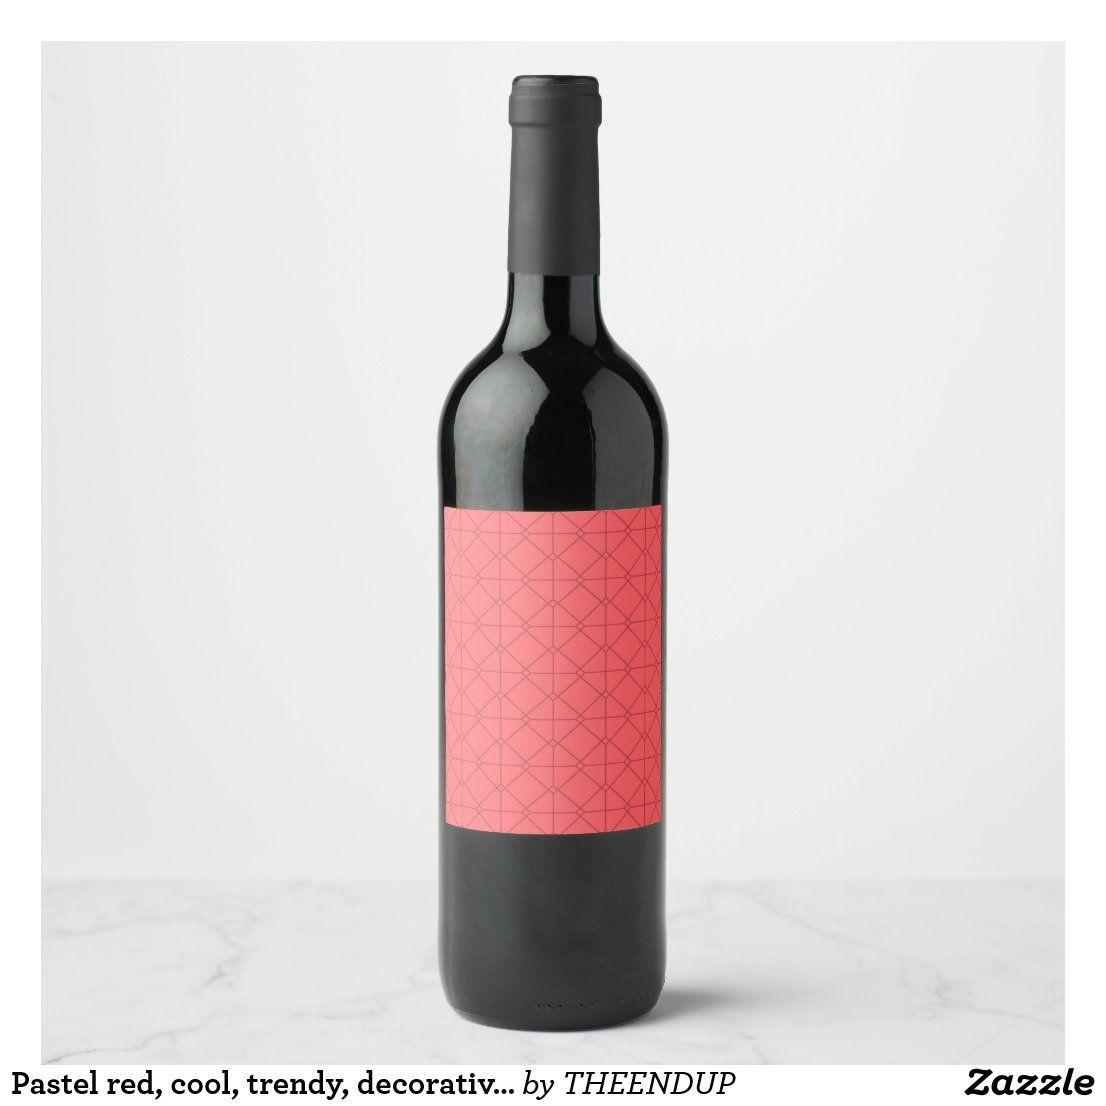 Pastel Red Cool Trendy Decorative Illustration Wine Label Zazzle Com In 2021 Wine Label Pastel Red Wine